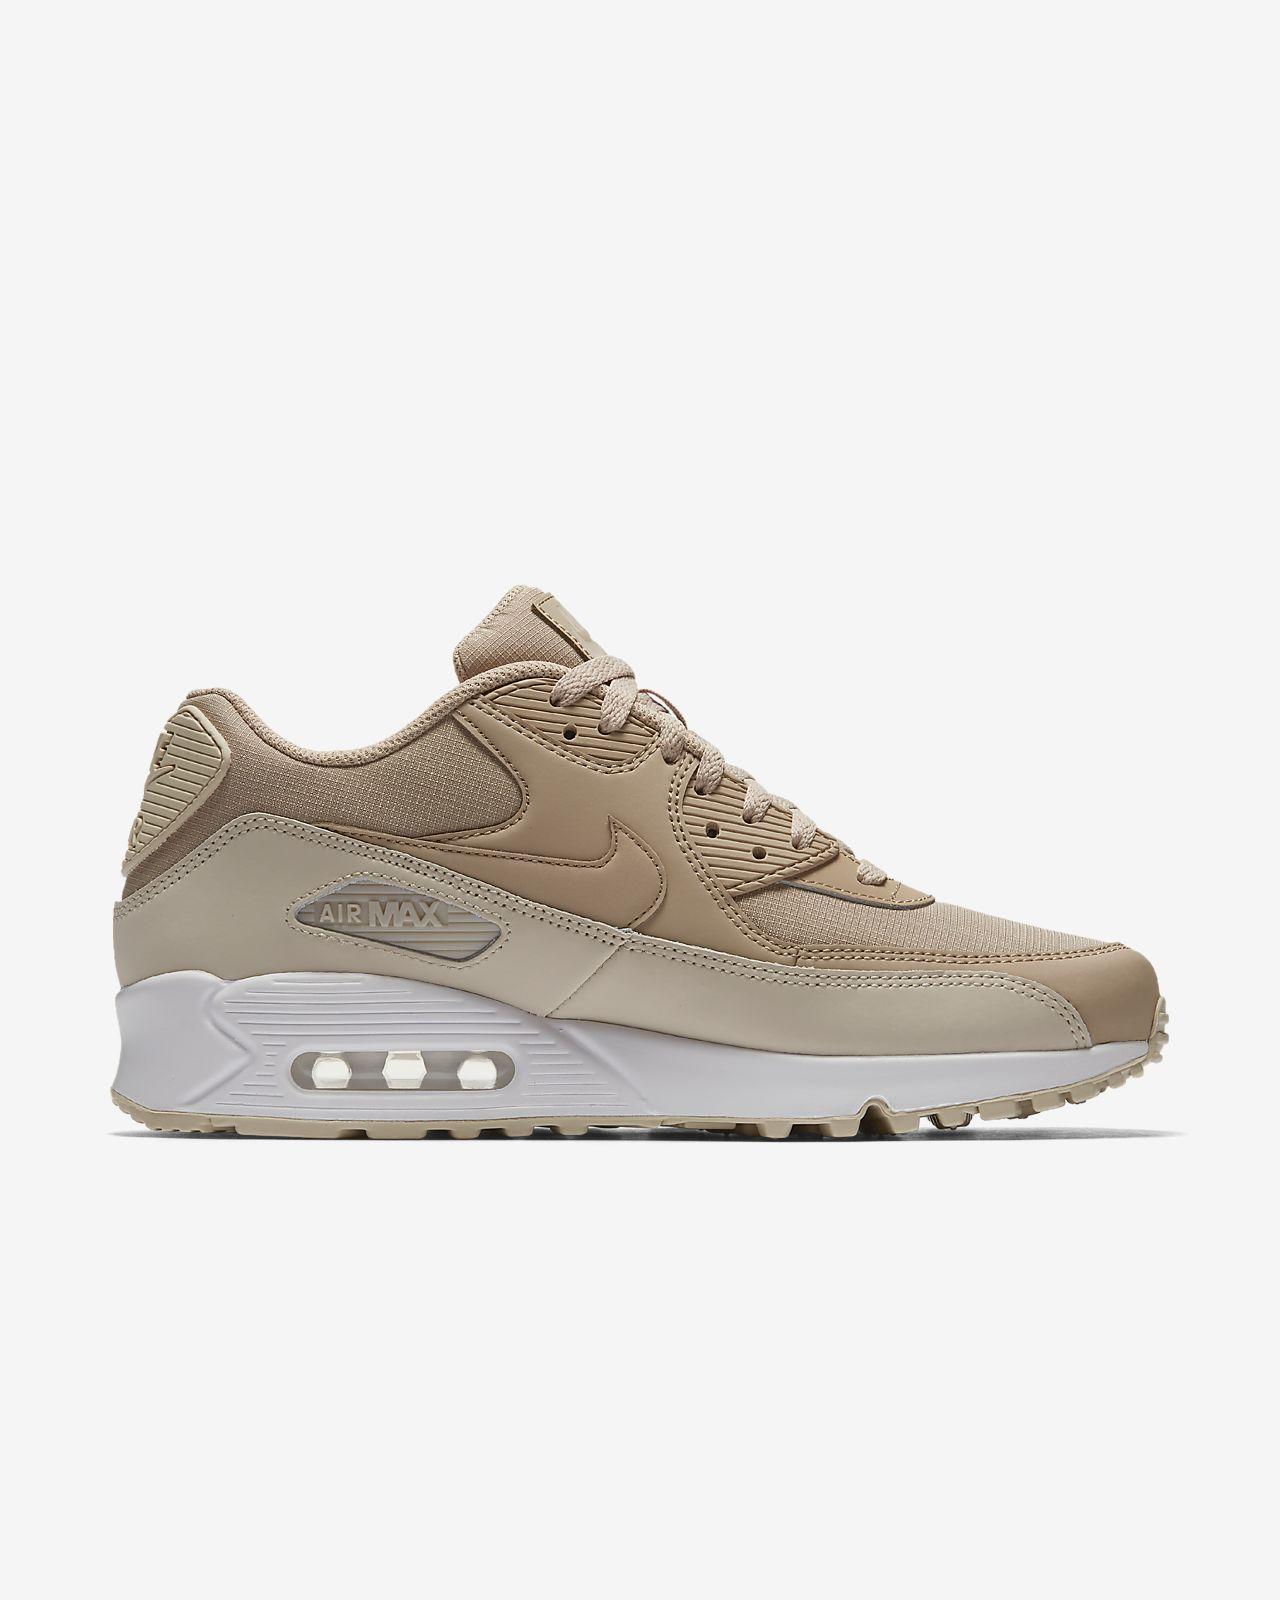 Beige Nike Air Max 90 Chaussures Pour Hommes QX1pume - marking ... cf80d88f9db2